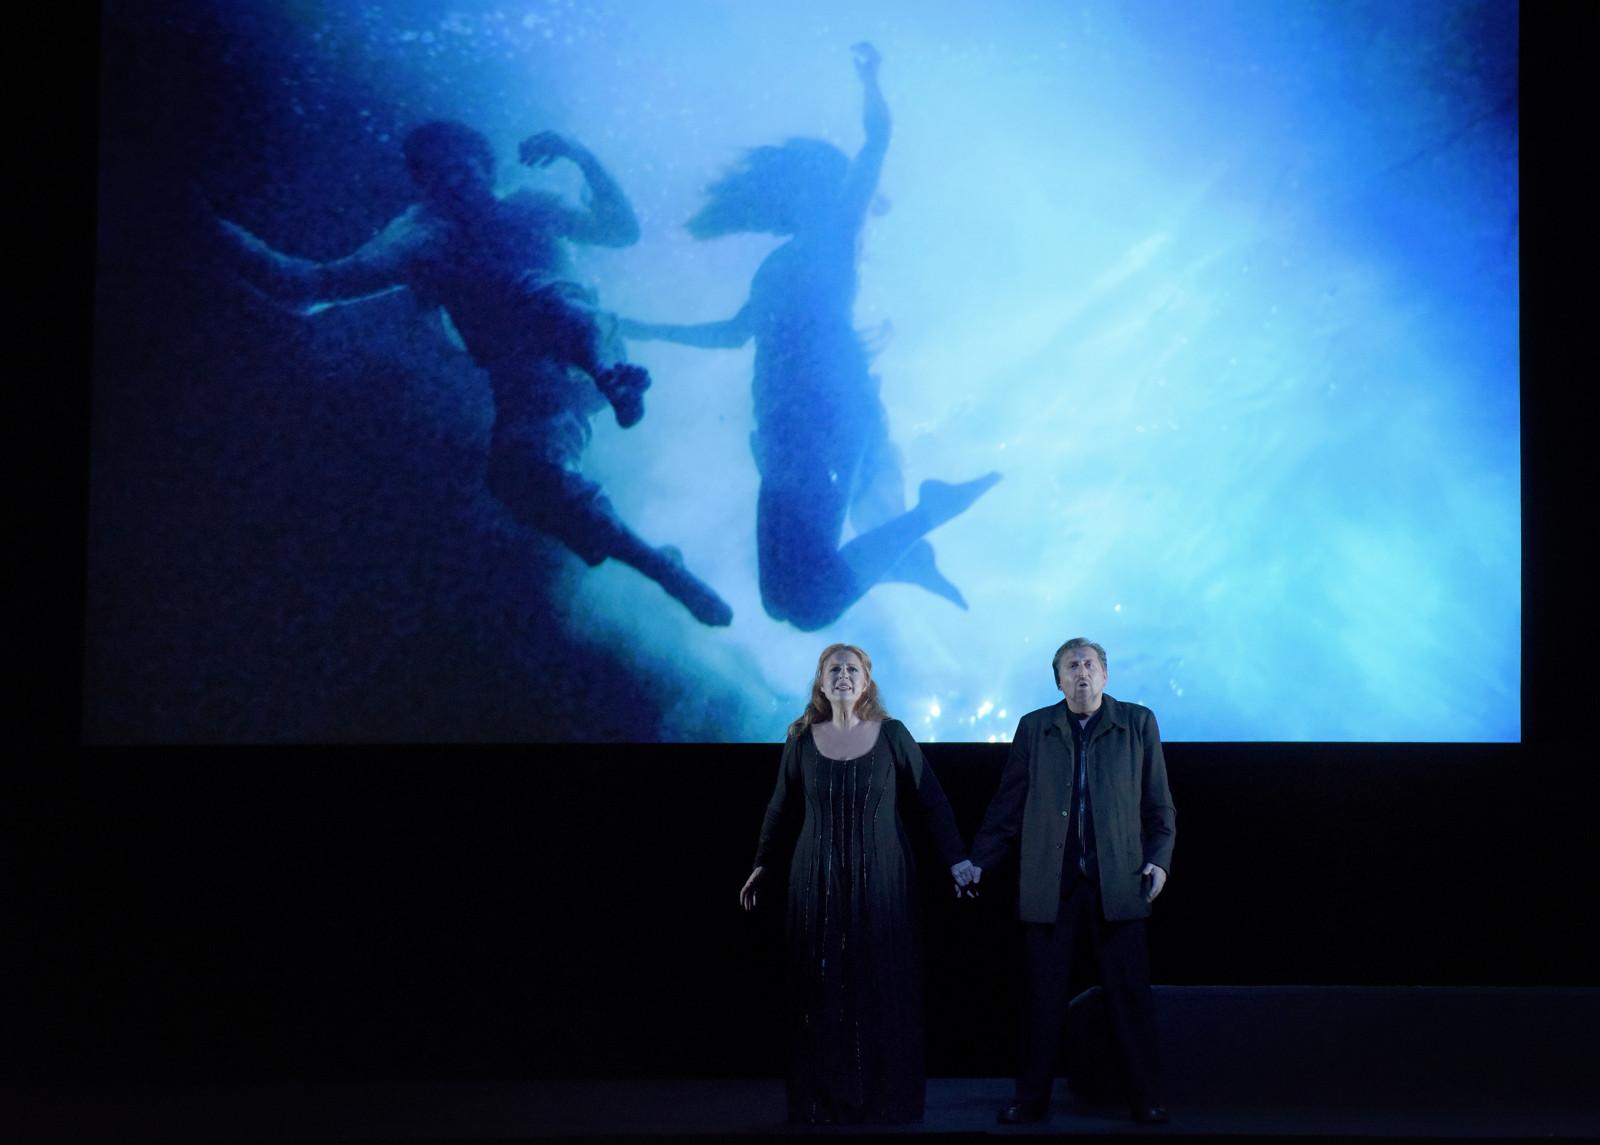 Martina Serafin (Isolde), Andreas Schager (Tristan) / © Vincent Pontet (OnP)